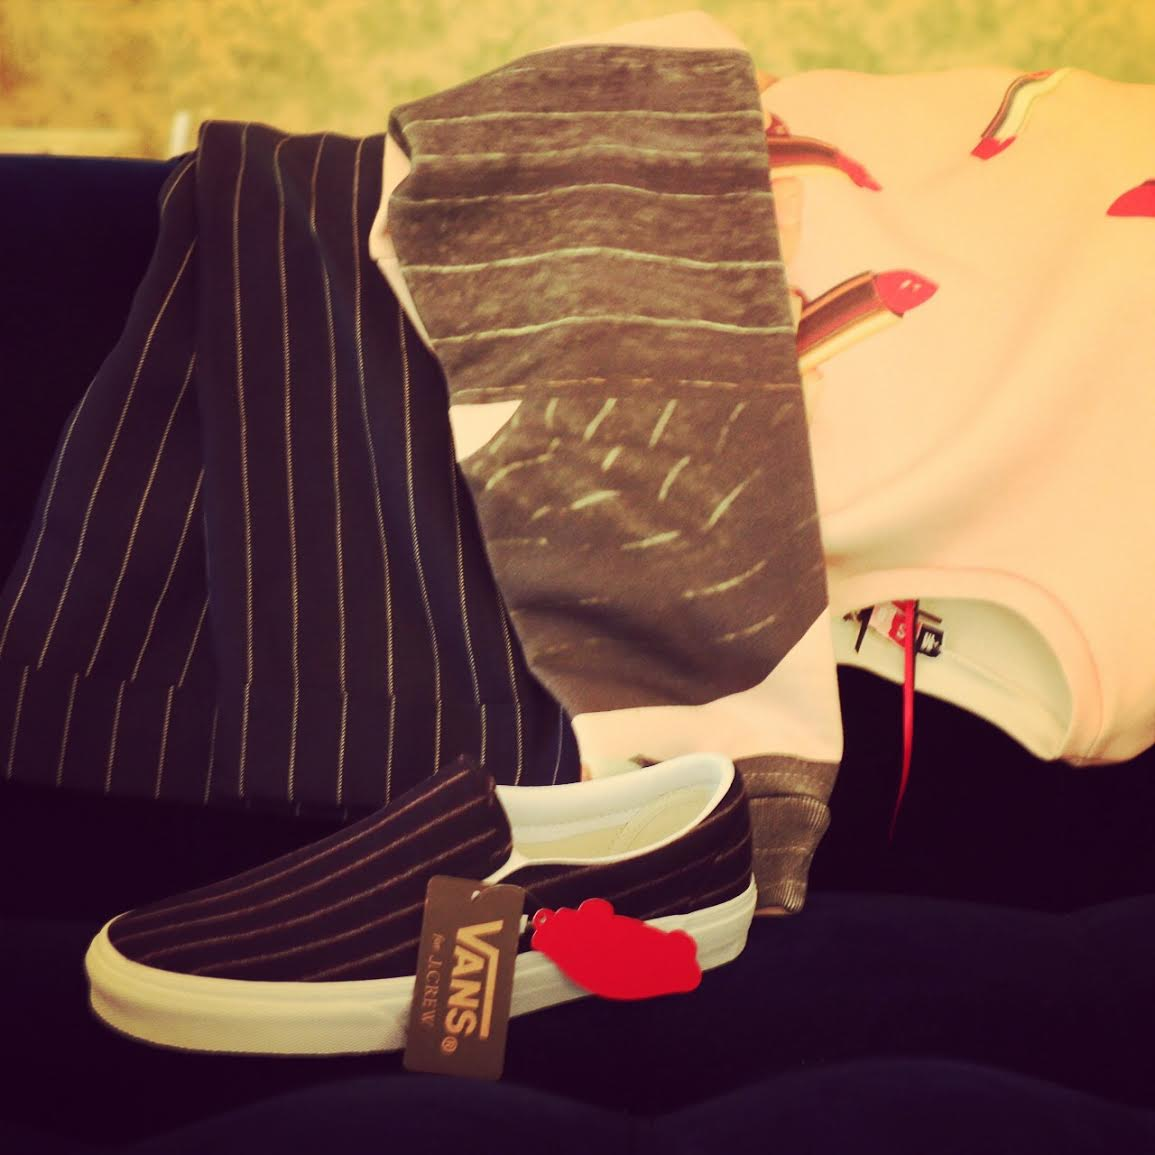 Lavrishina blog vans jcrew sneakers set